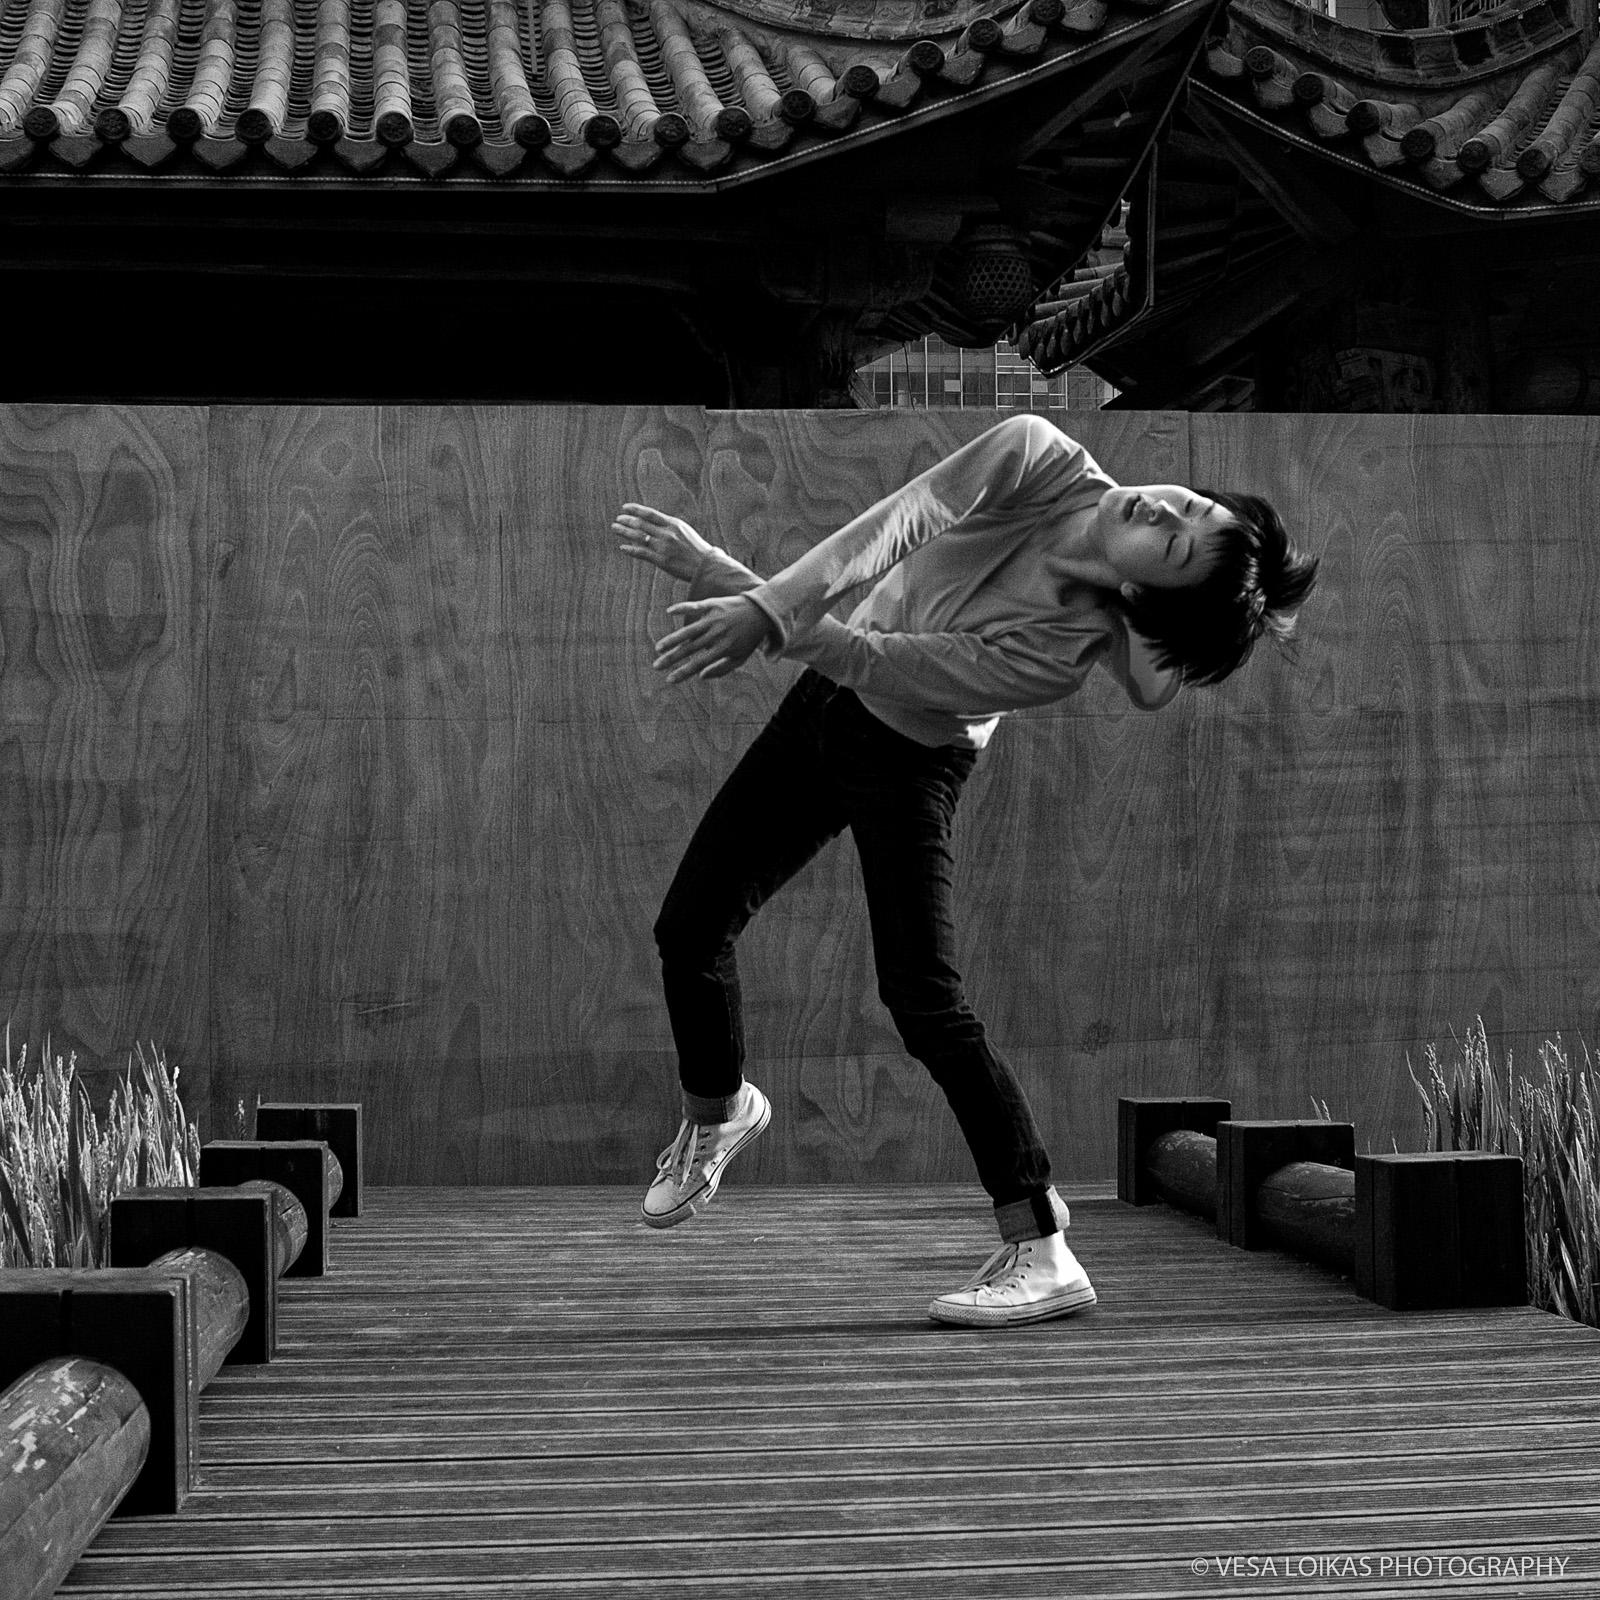 'CHARACTER DANCER' - ALUMINUM 1st EDITION PRINT AVAILABLE 上海证大喜玛拉雅中心 - Zendai Himalayas Center, 1188 Fangdian Road, Pudong New District, SHANGHAI, CHINA - 2014 dancer: Yanan Liu